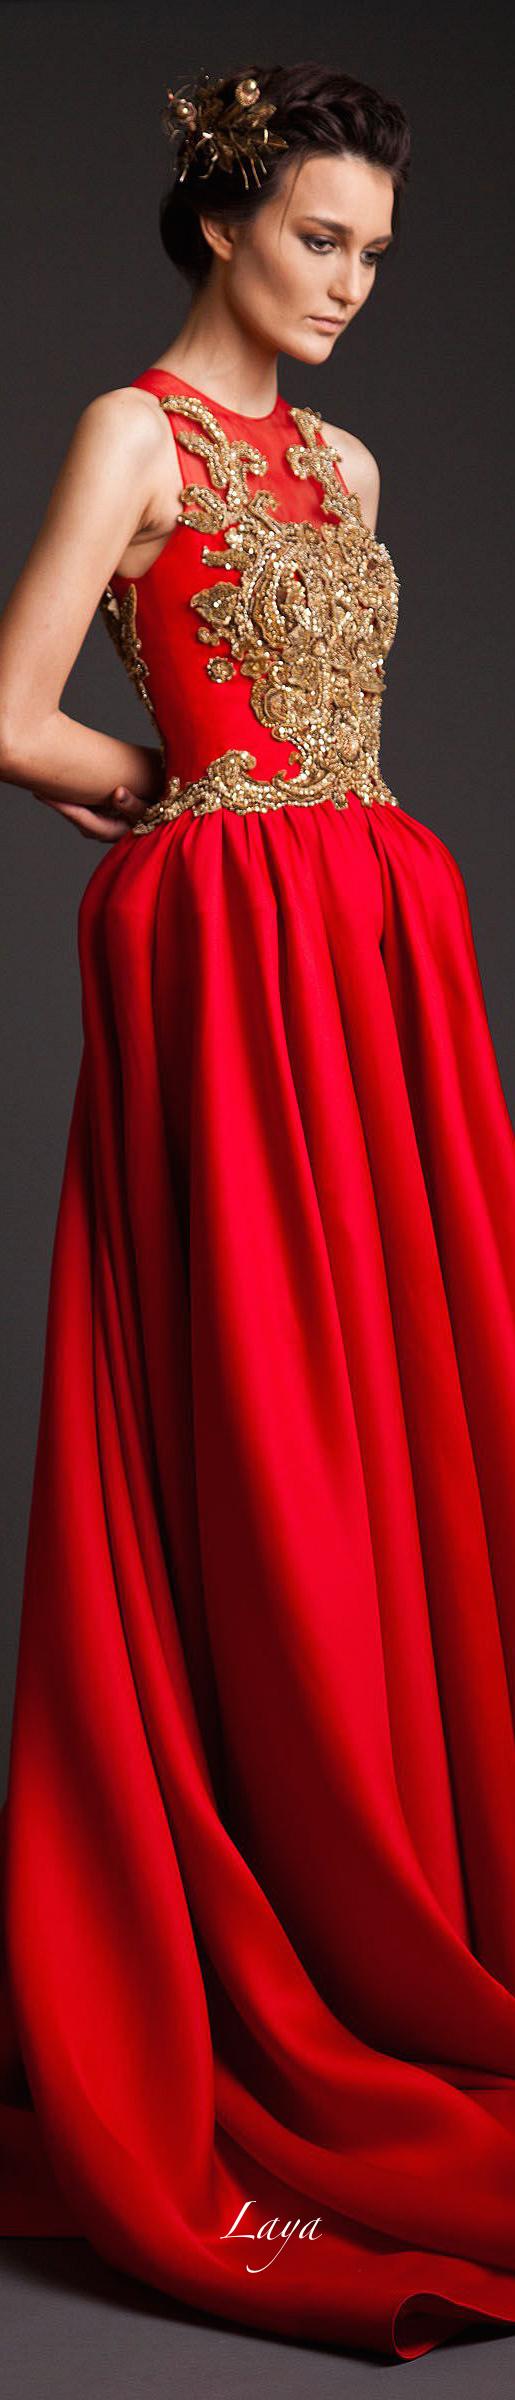 "Krikor Jabotian Couture S/S 2014 entitled ""AhkTamar"""